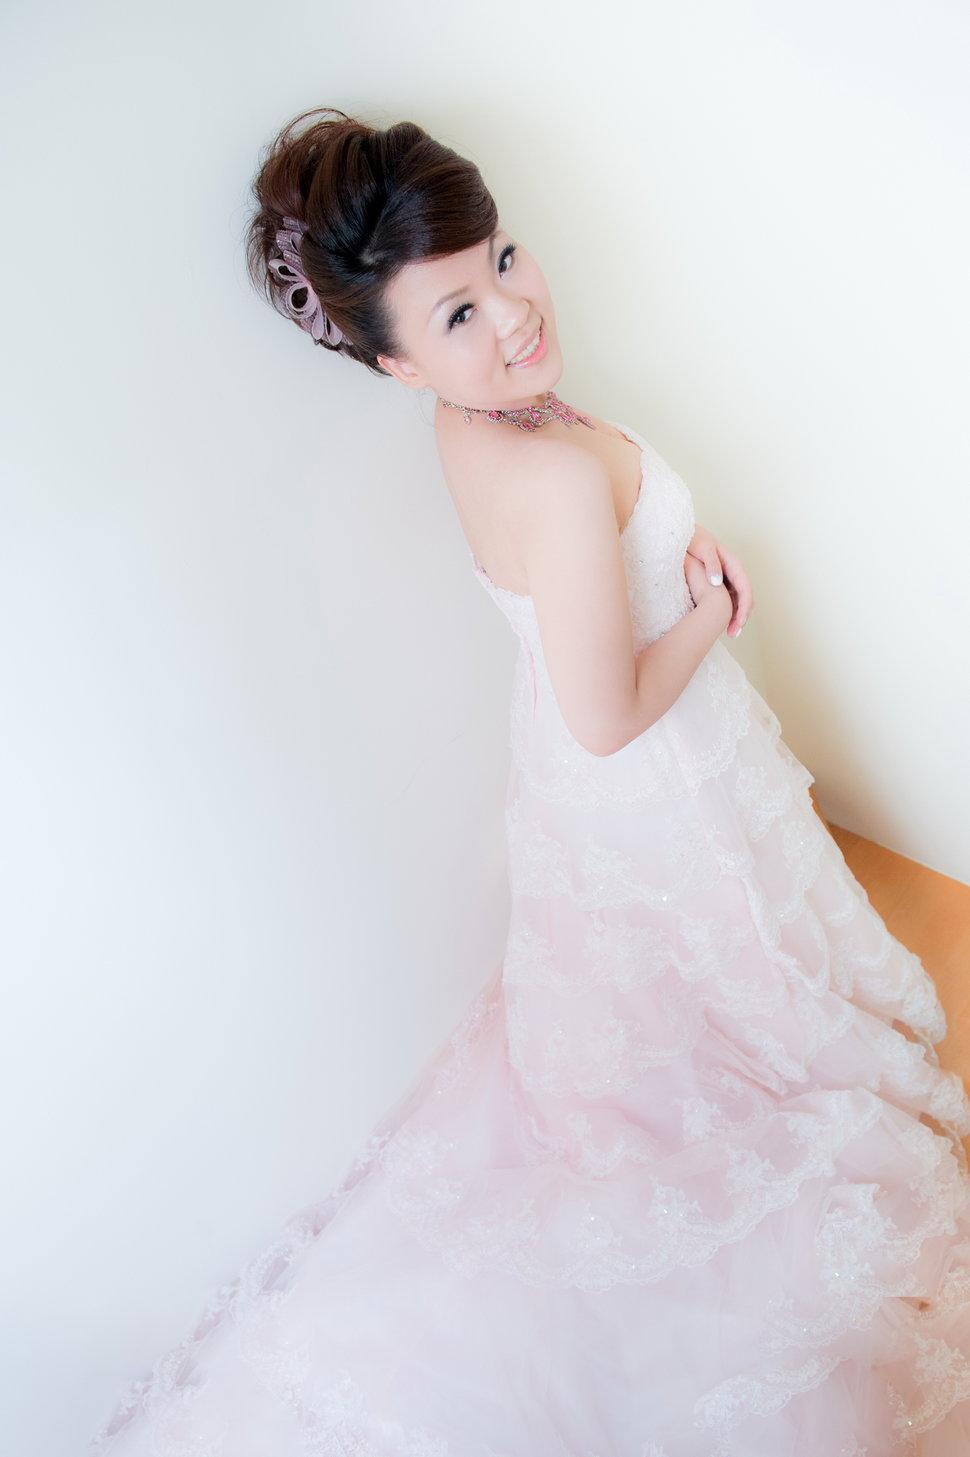 DSC_3335 - 婚攝溏威自助婚紗婚禮紀錄新秘孕寫真全家福《結婚吧》